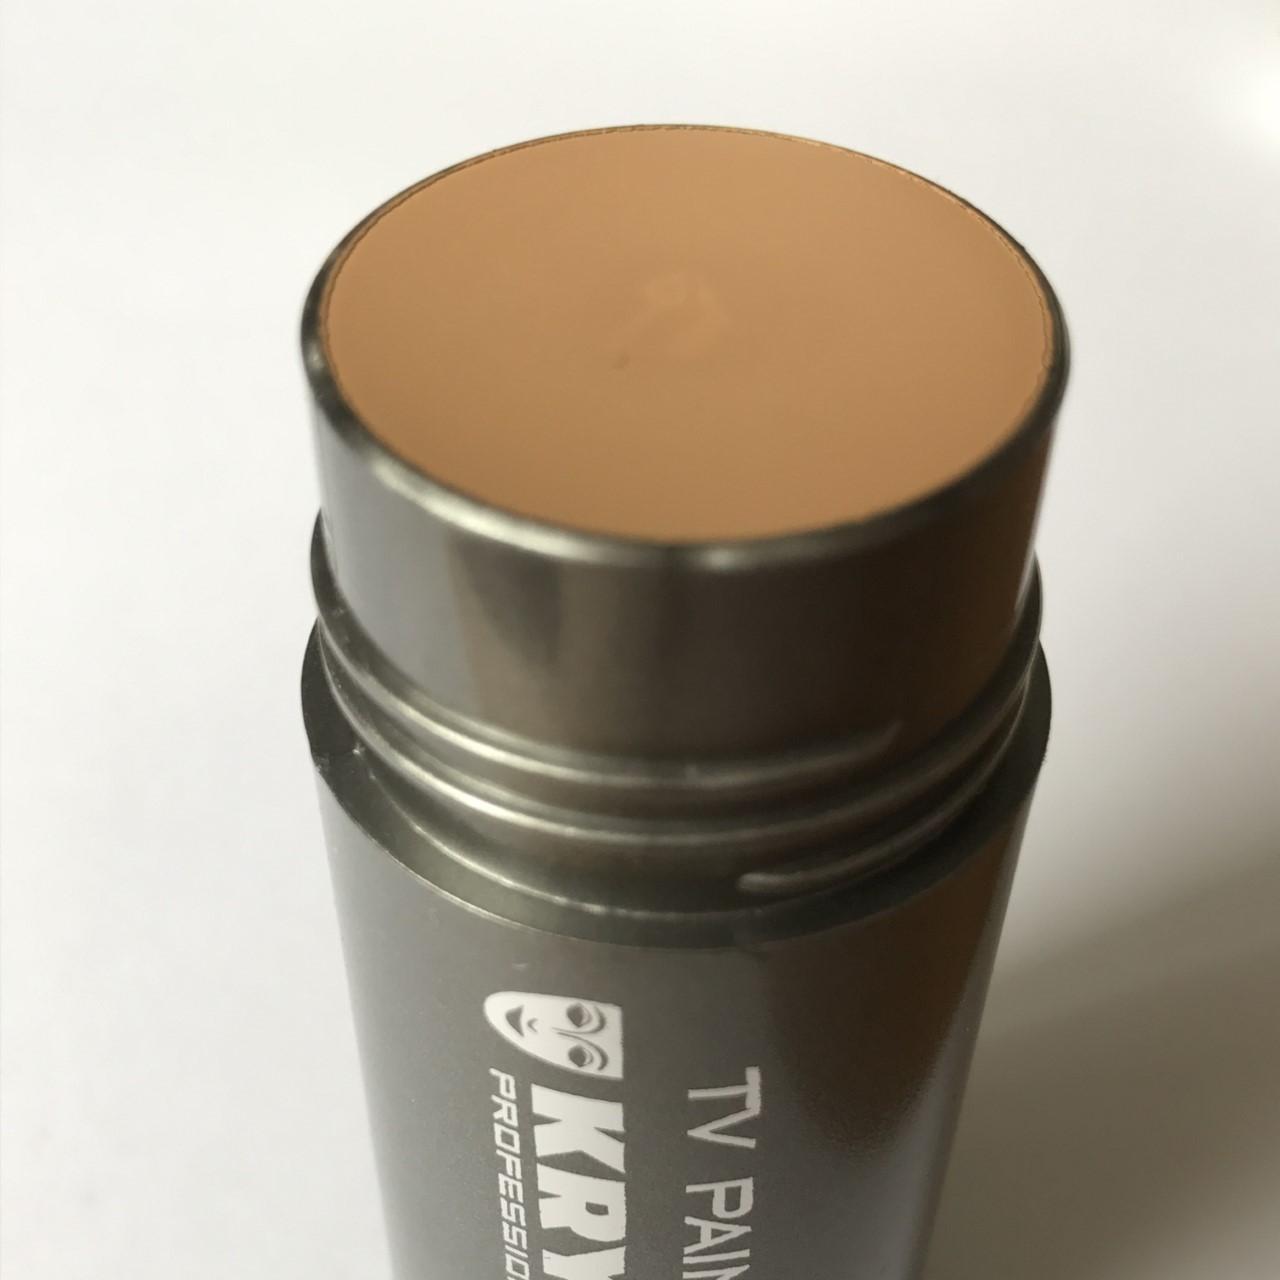 Maquillage kryolan paint stick 5047 nb1